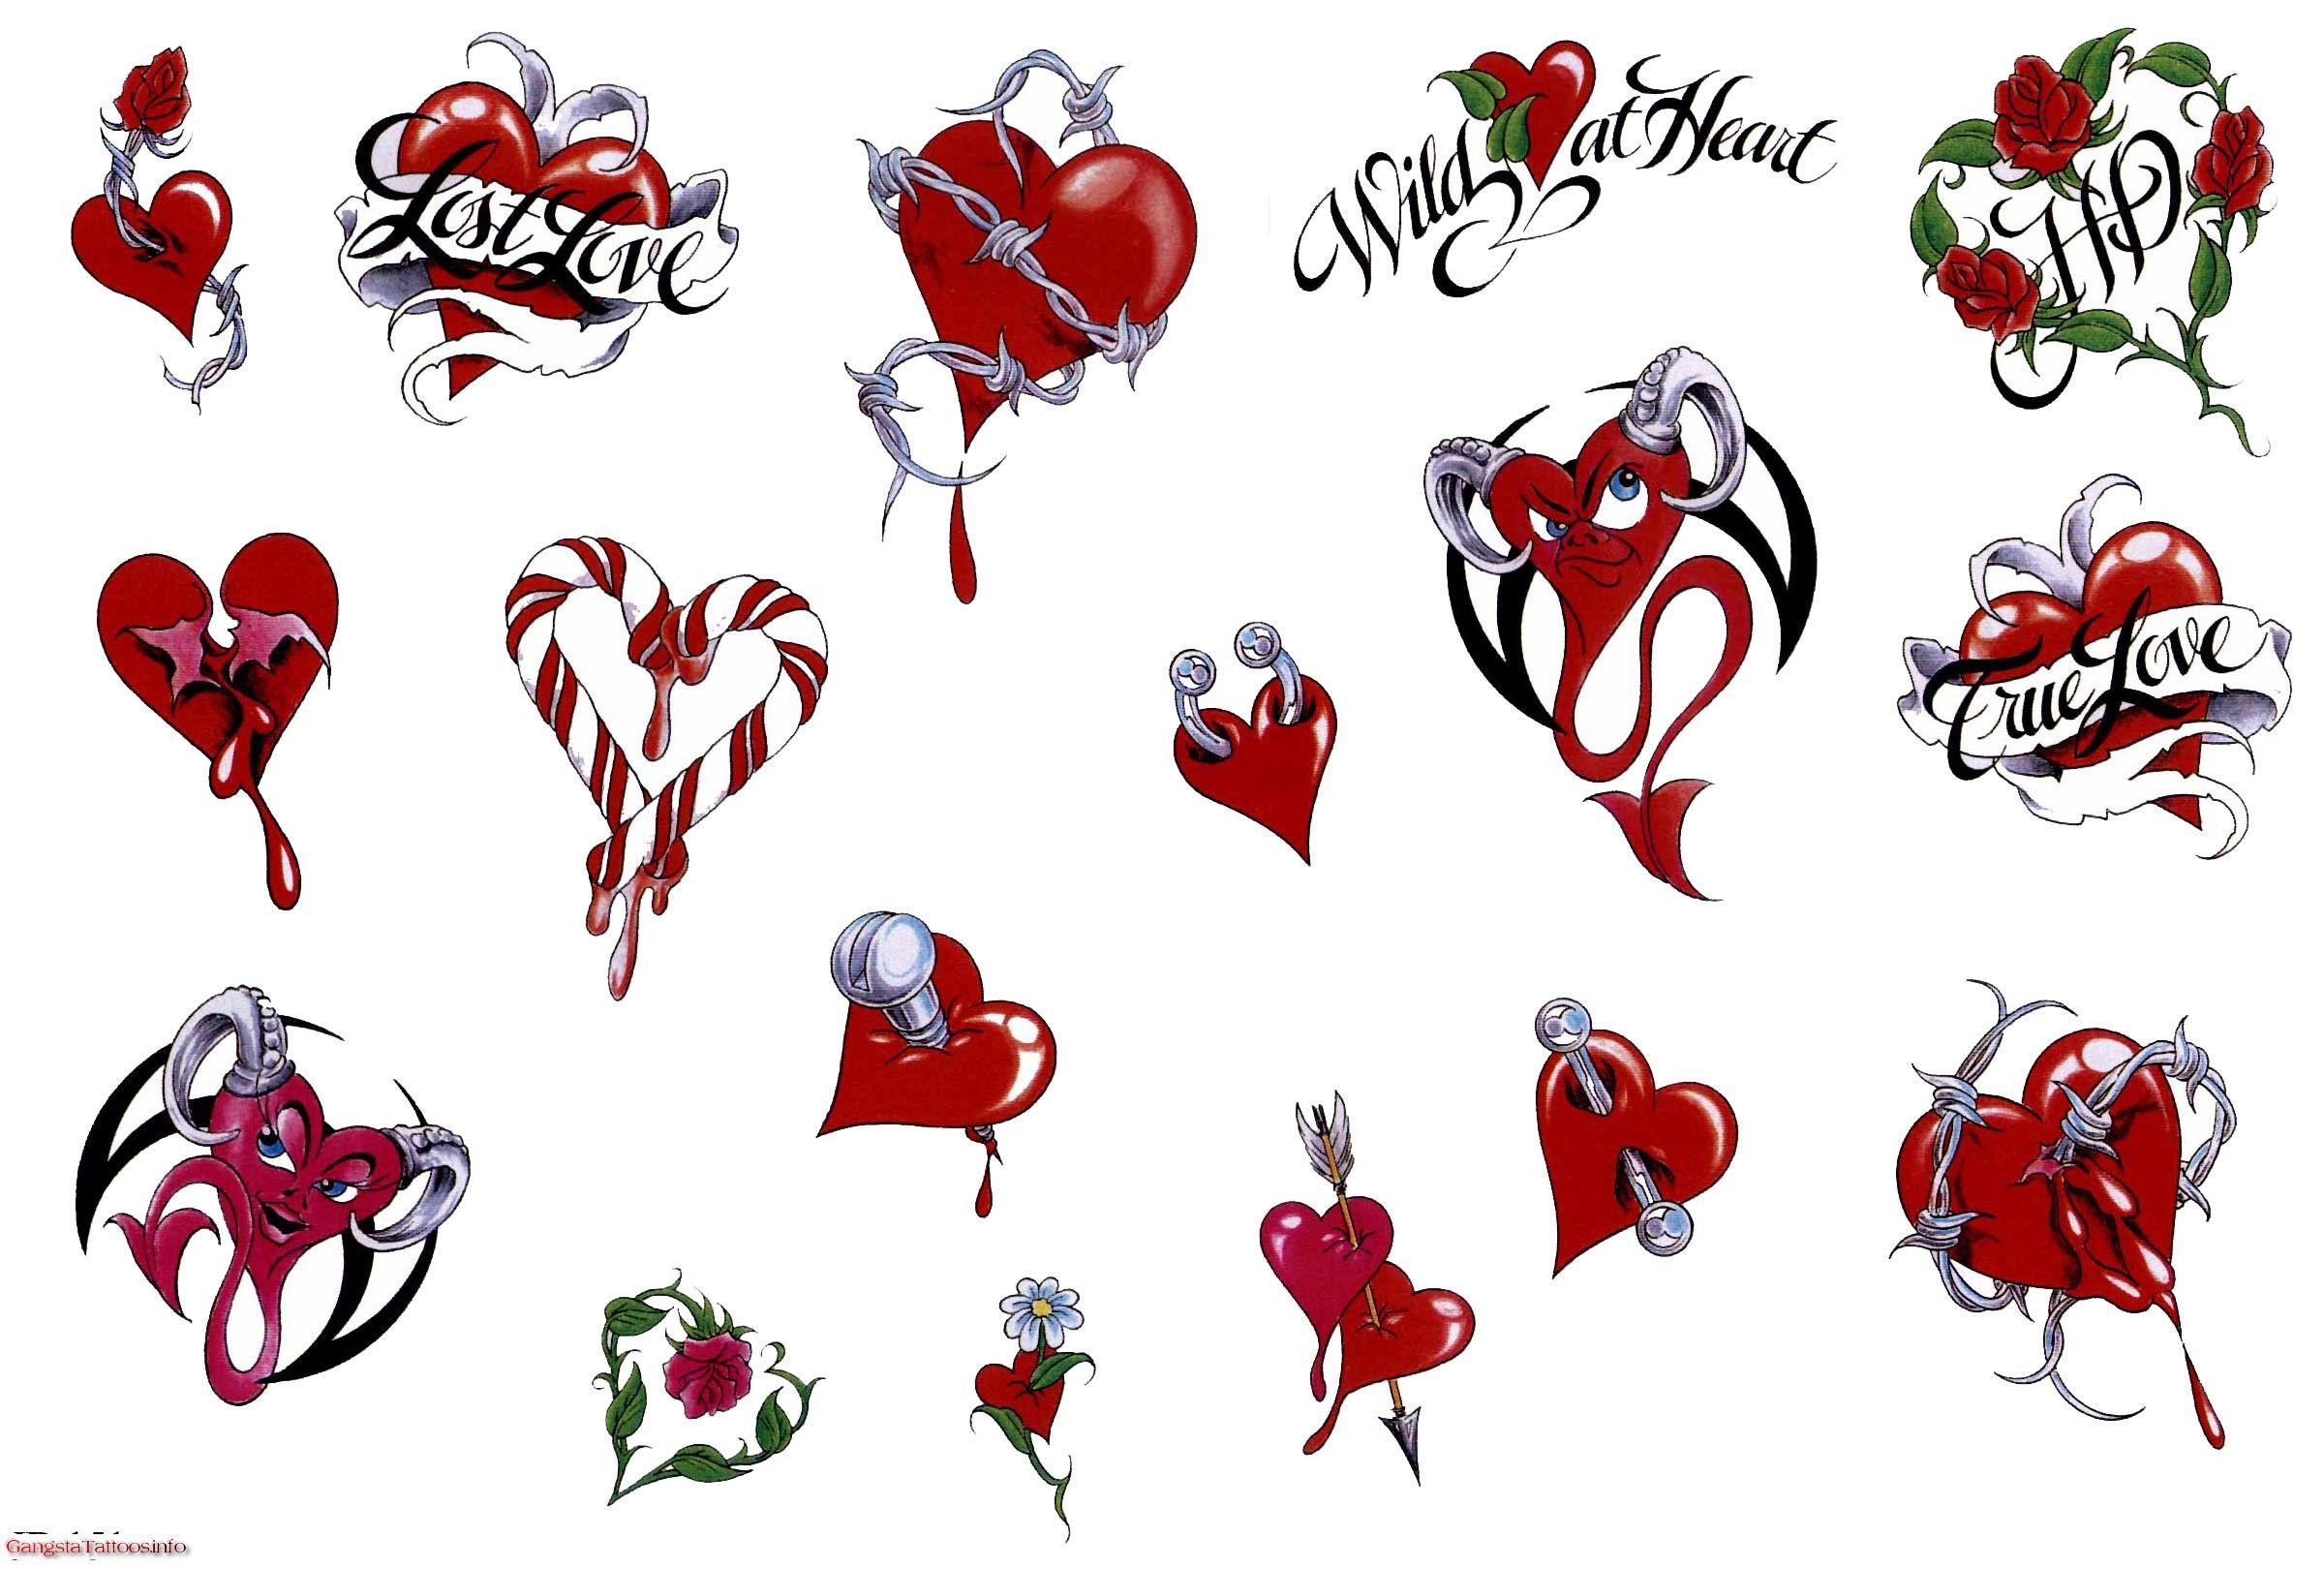 Heartbreak Tattoos Heart Tattoos. A wide selection of